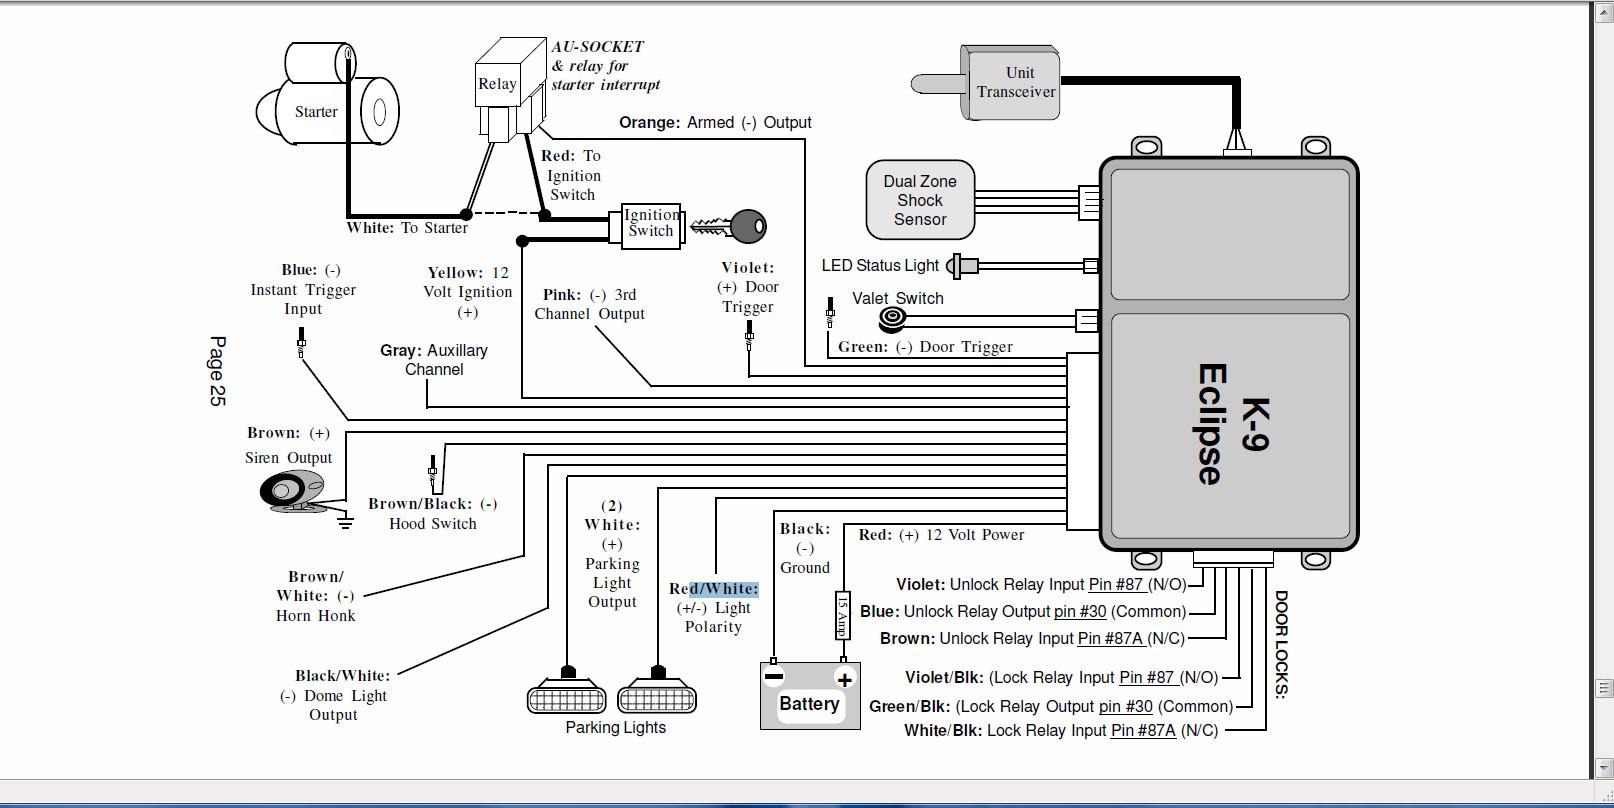 Bulldog Deluxe 500 Wiring Diagram | Wiring Diagram - Bulldog Wiring Diagram